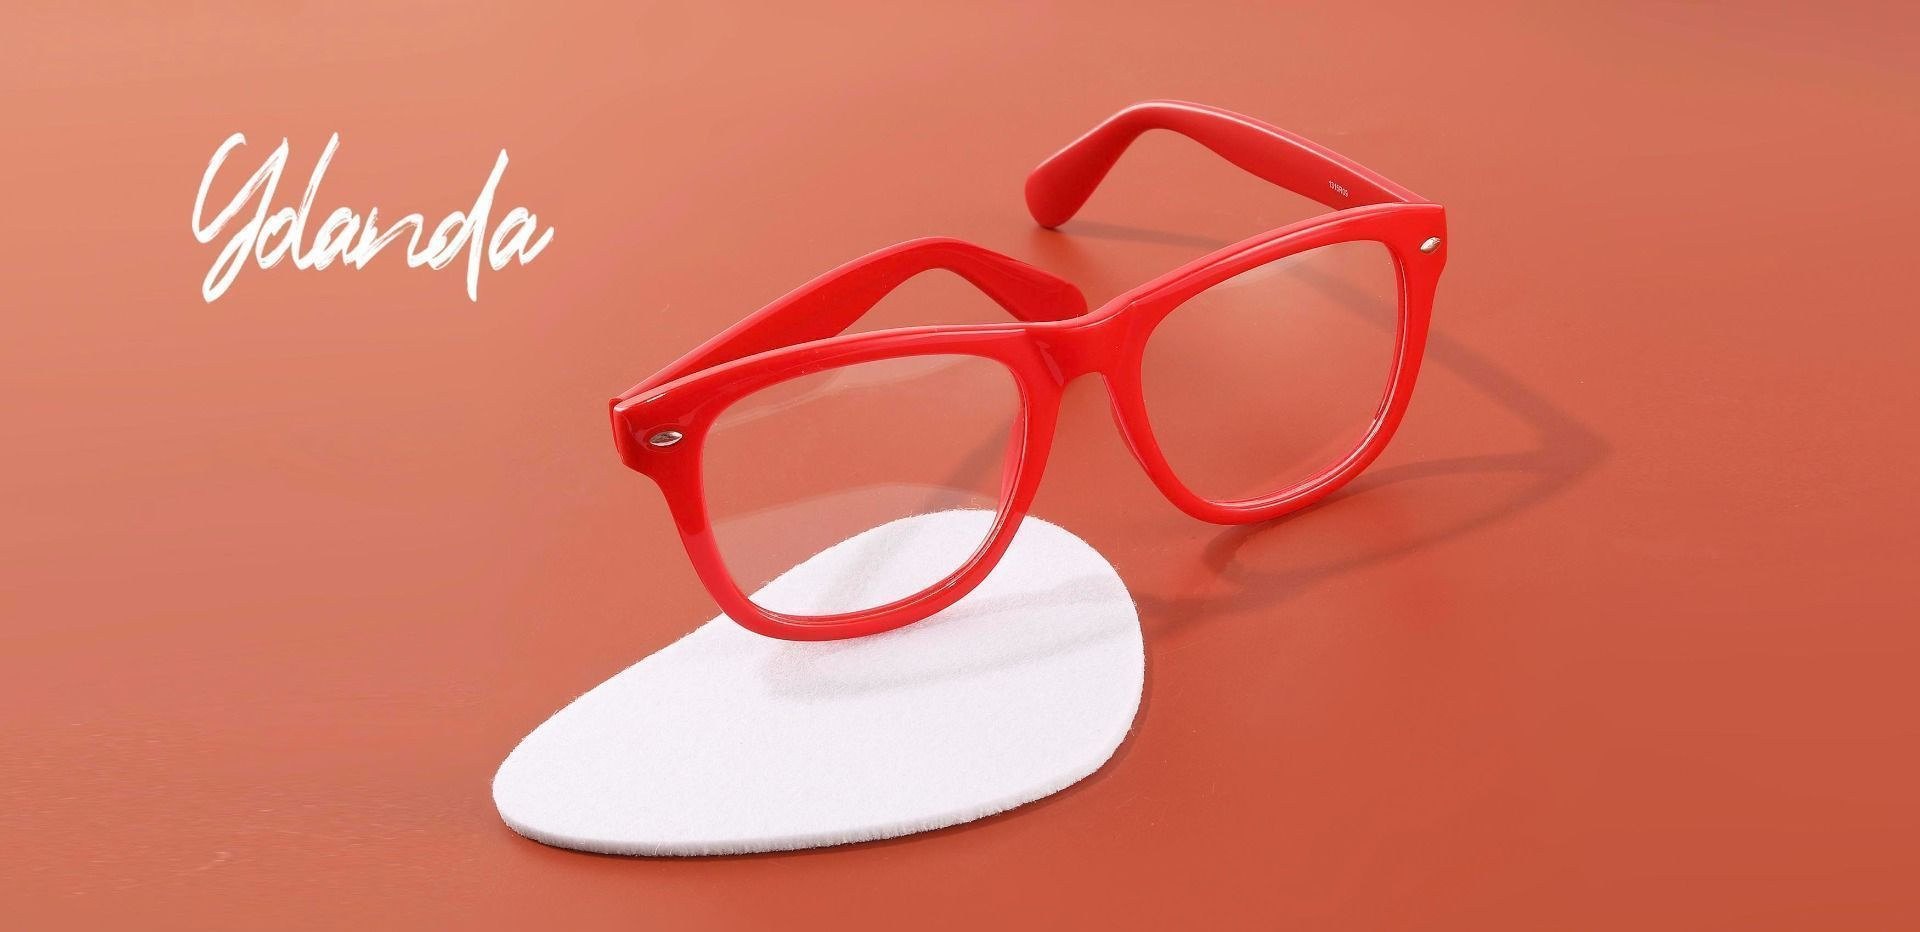 Yolanda Square Lined Bifocal Glasses - Red